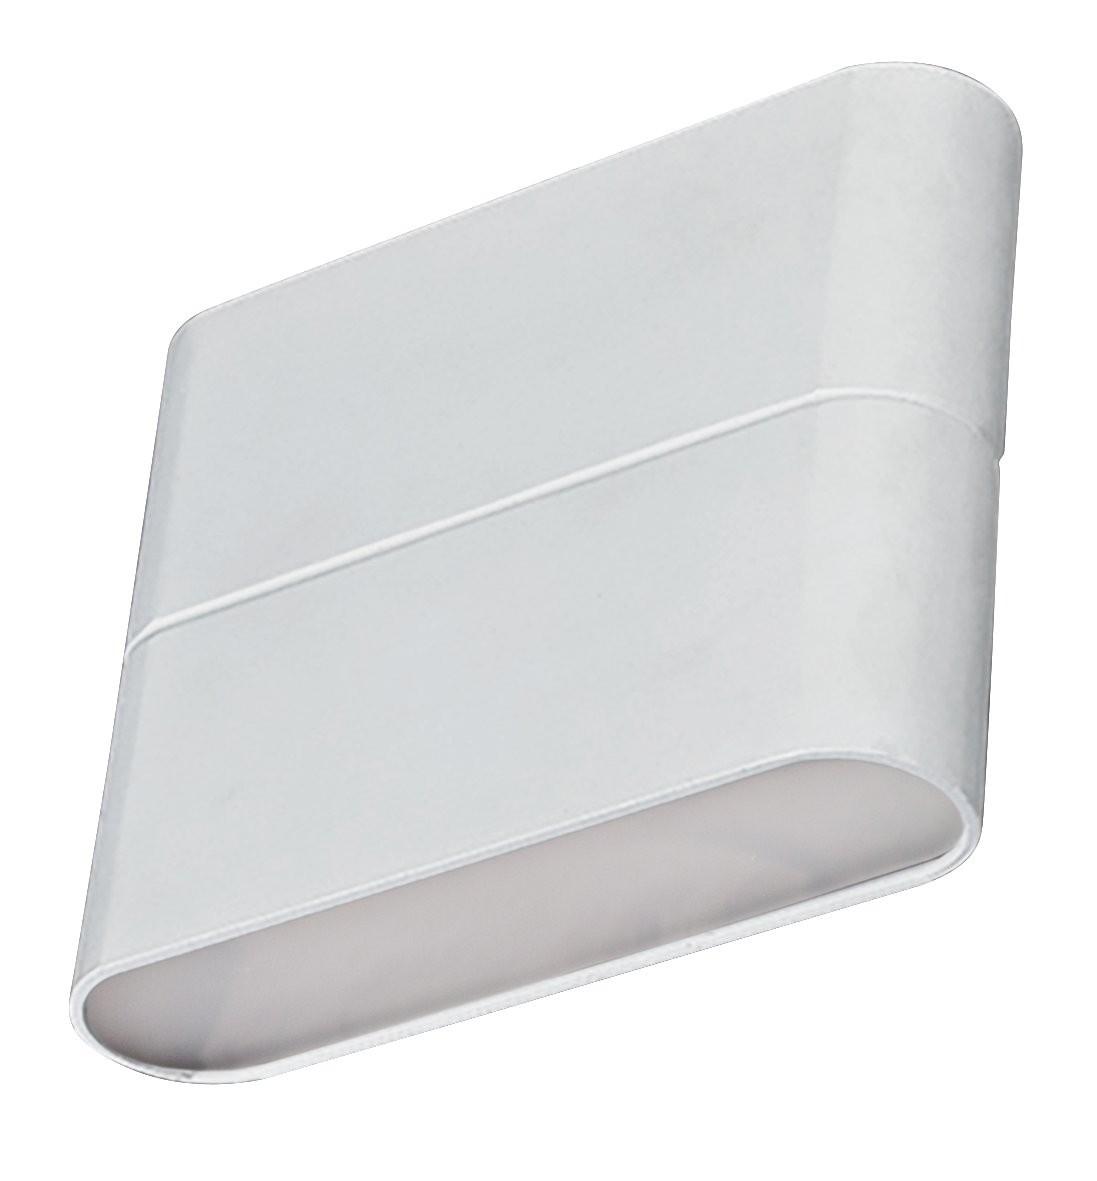 LED Außenwandleuchte Simbo 8W 3000 K 110x90 mm weiß IP54